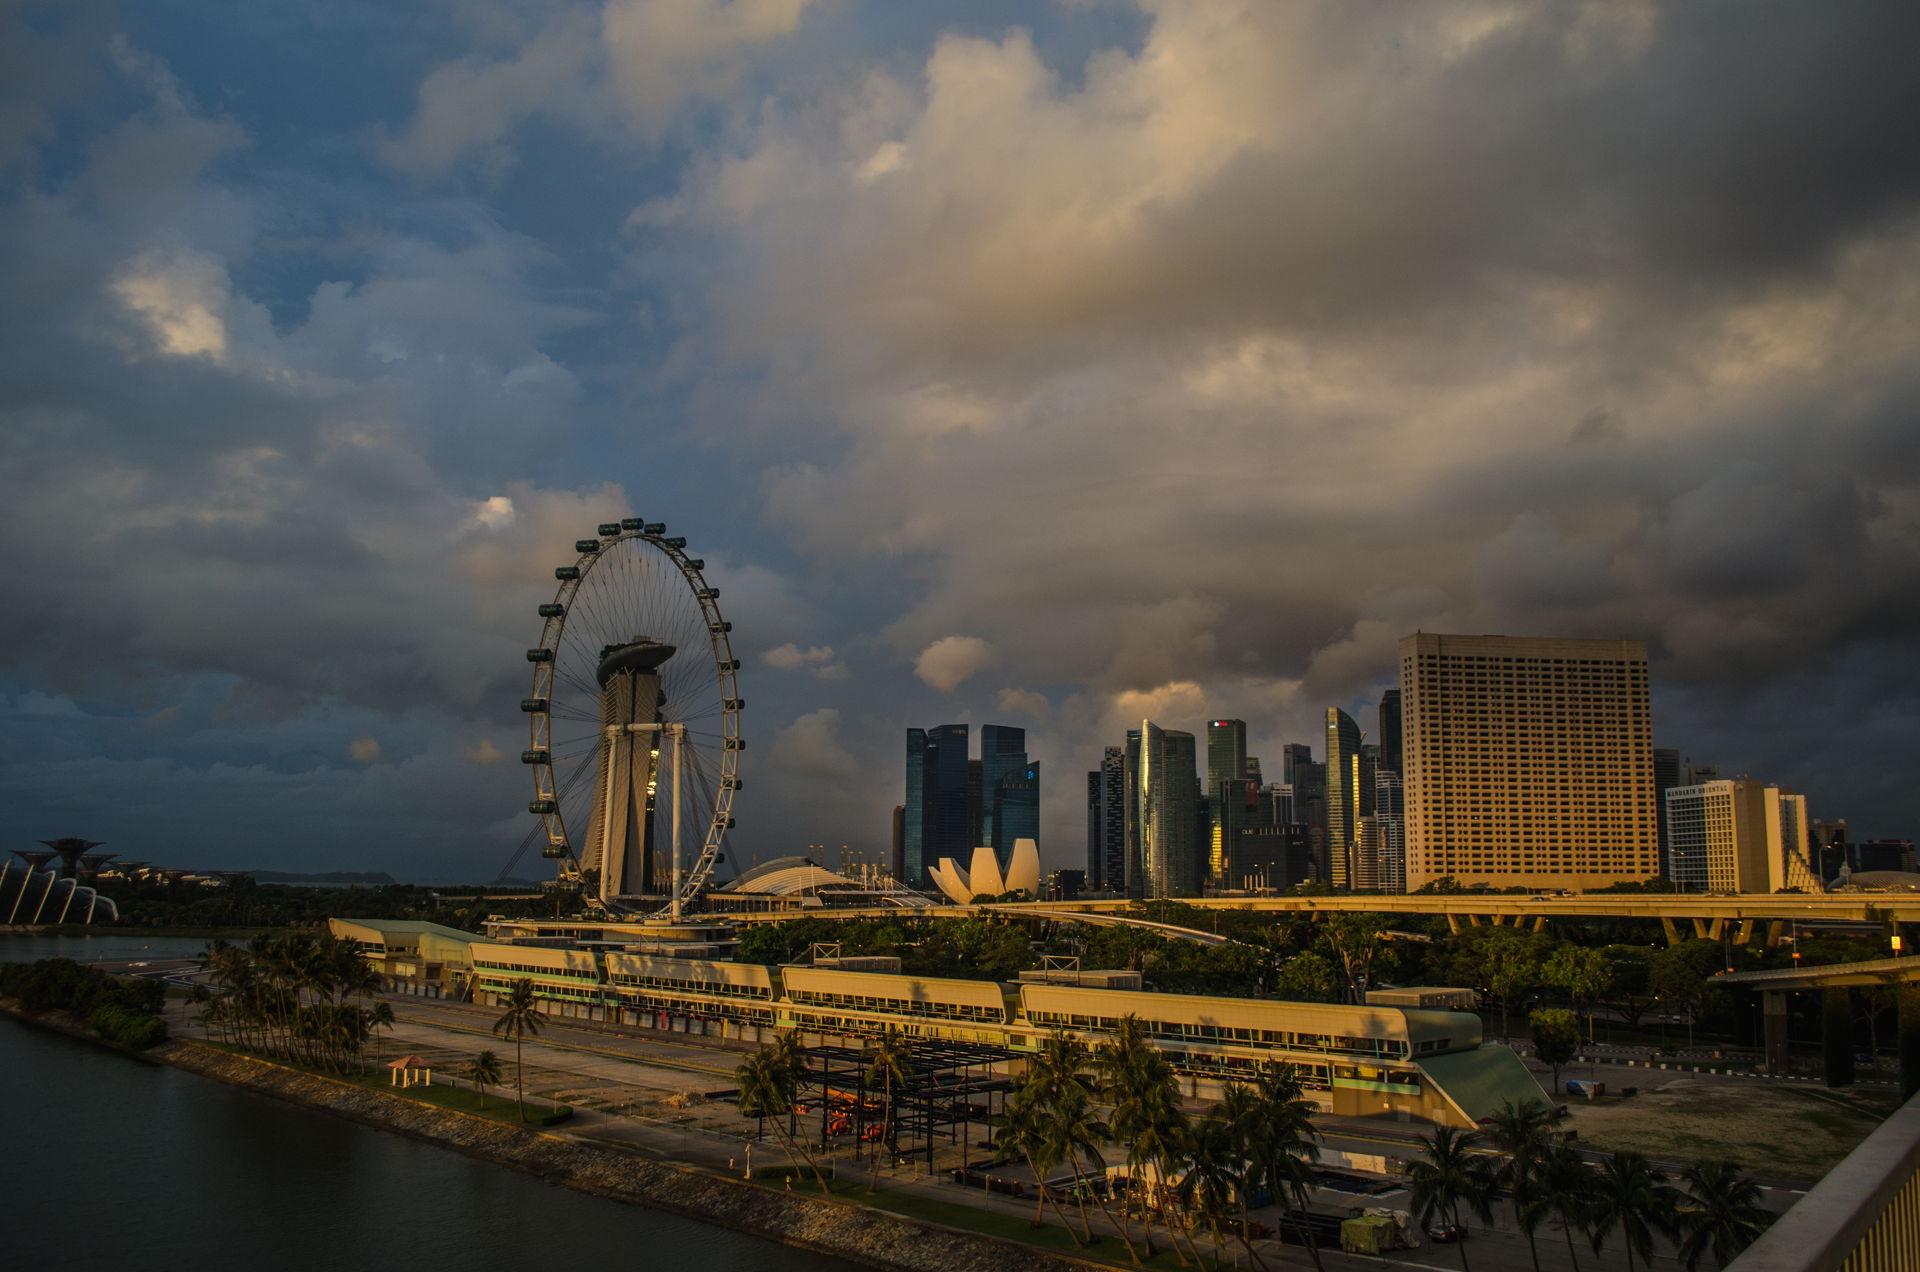 Singapore, singapore downtown, singapore amazing, singapore sunrise, best picture of singapore, best singapore downtown picture, sunrise, sunrise singapore, sunrise singapore downtown, sunrise flyer singapore, where to fly drone at singapore, singapore drone guidelines, best drone places singapore, singapore laws, singapore regulations